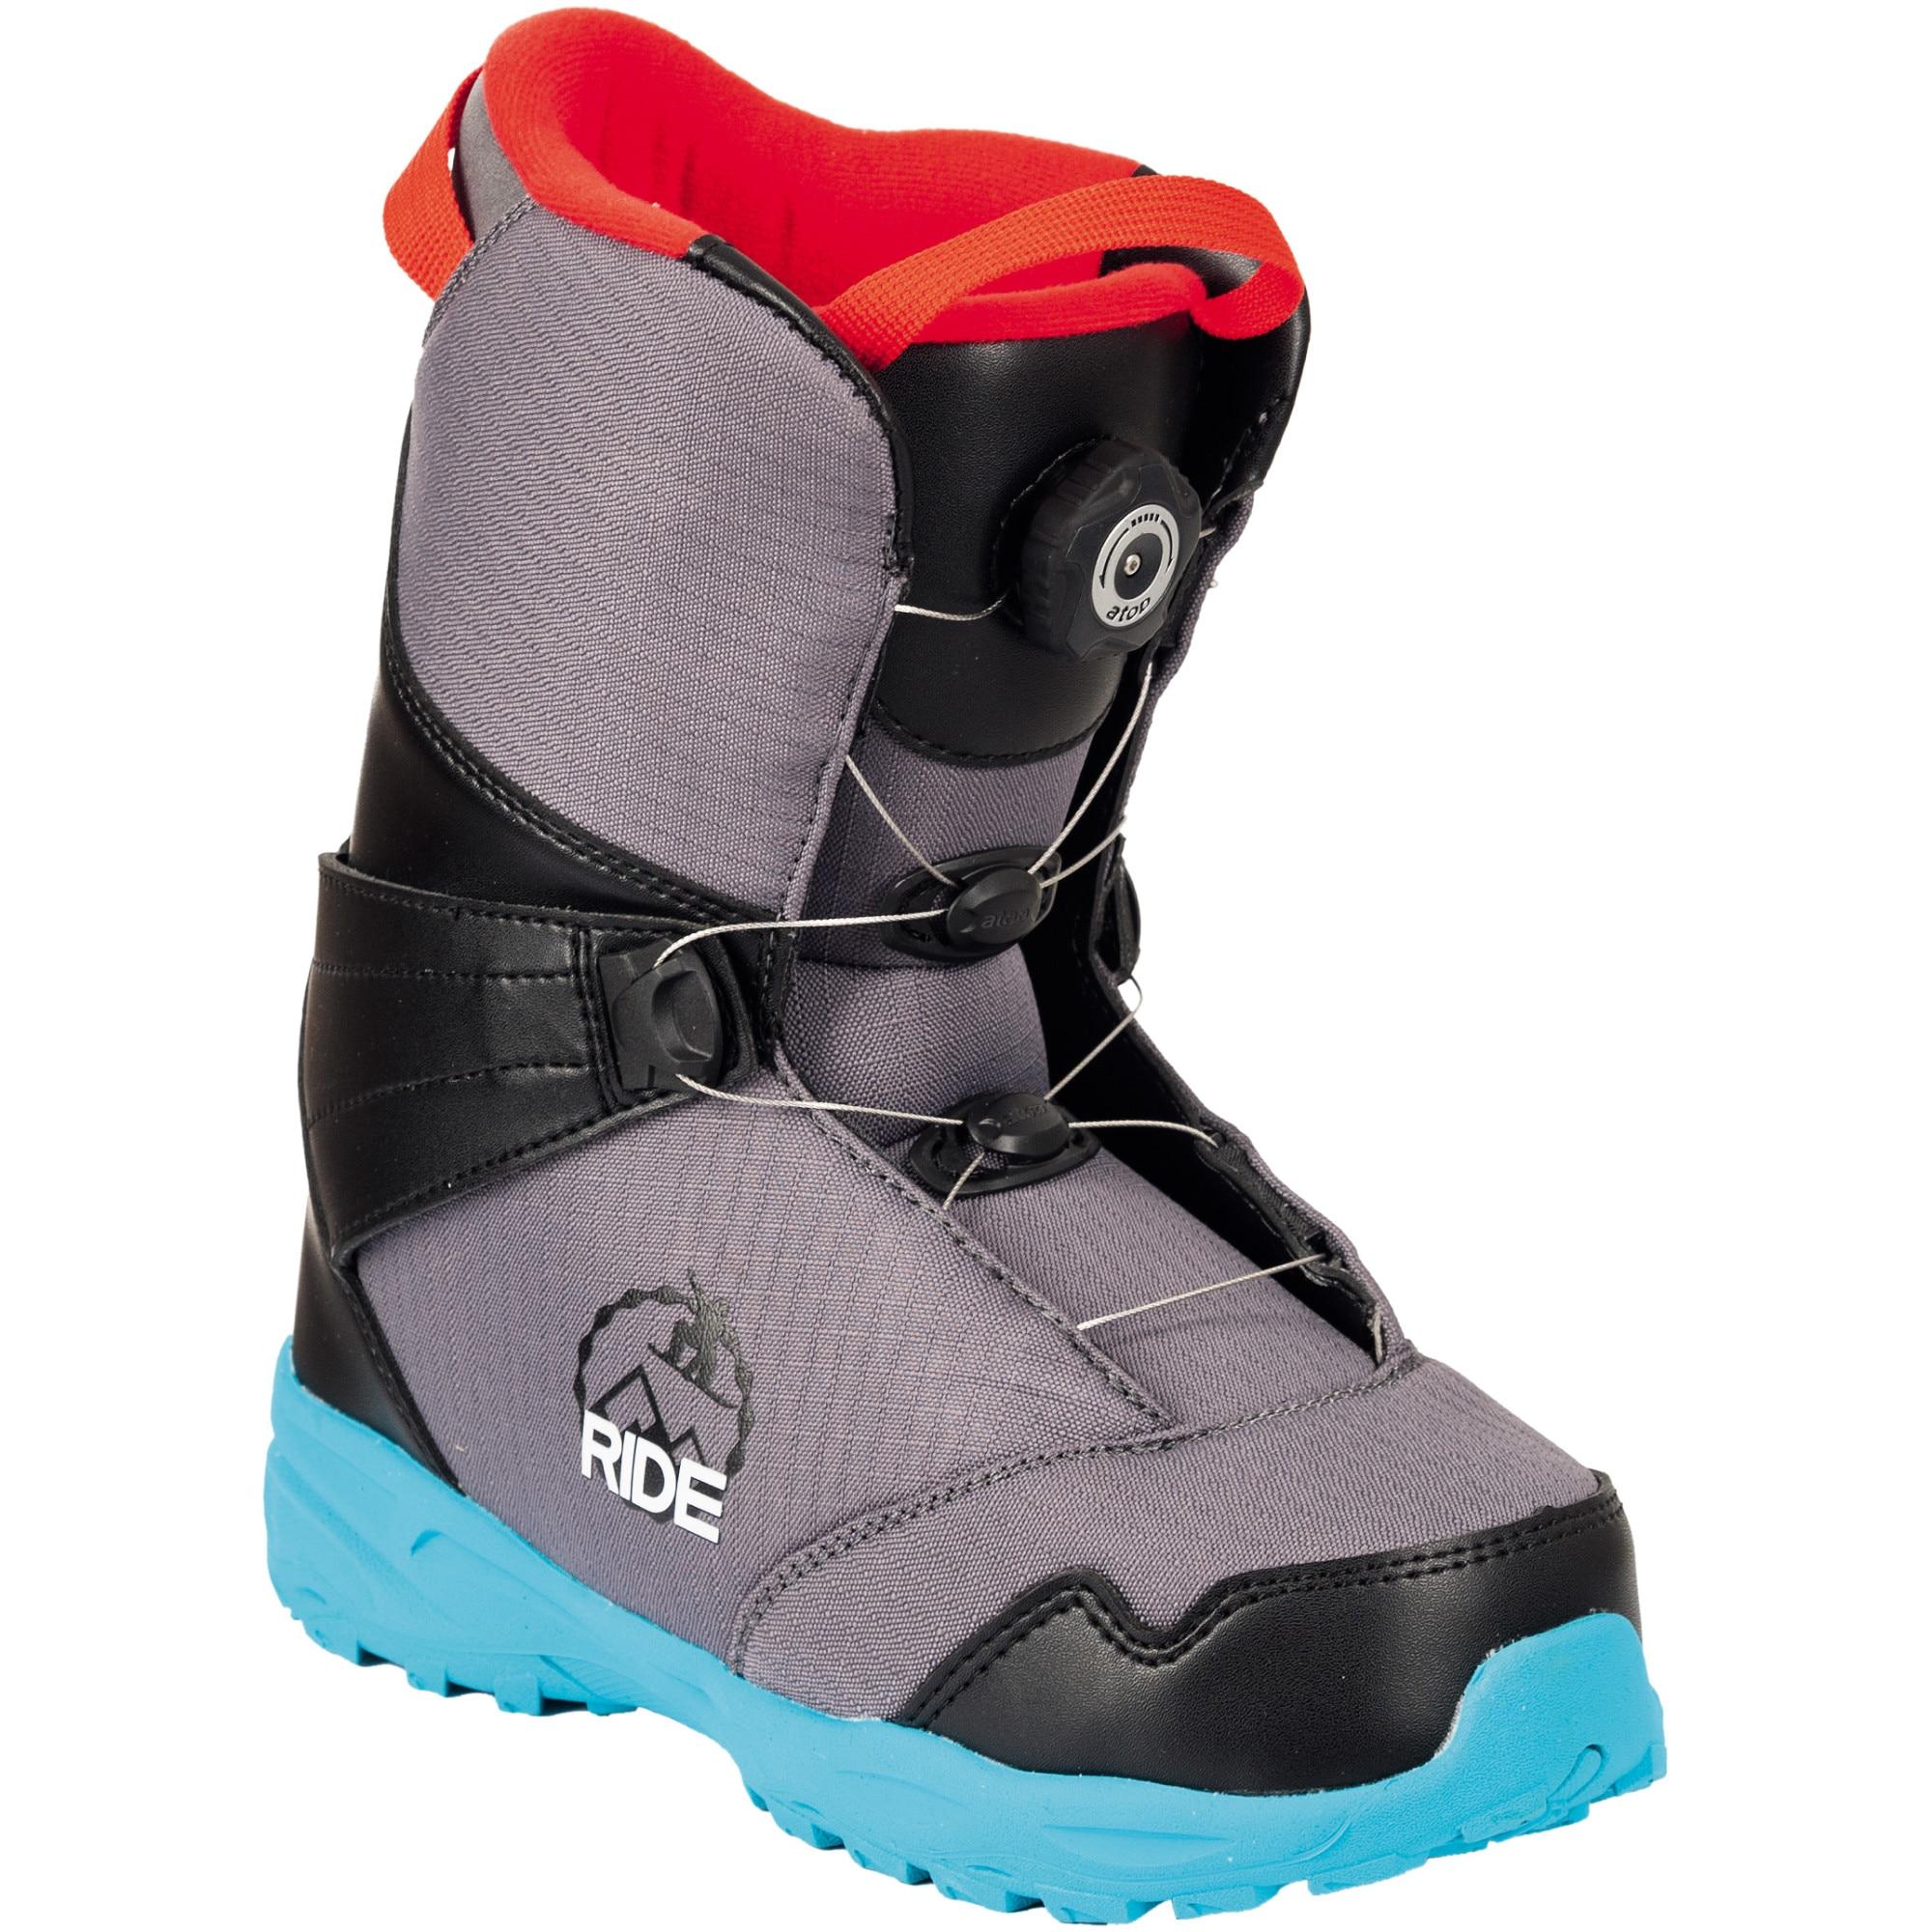 Fotografie Ghete snowboard Atop,Copii,Albastru, Albastru, 22